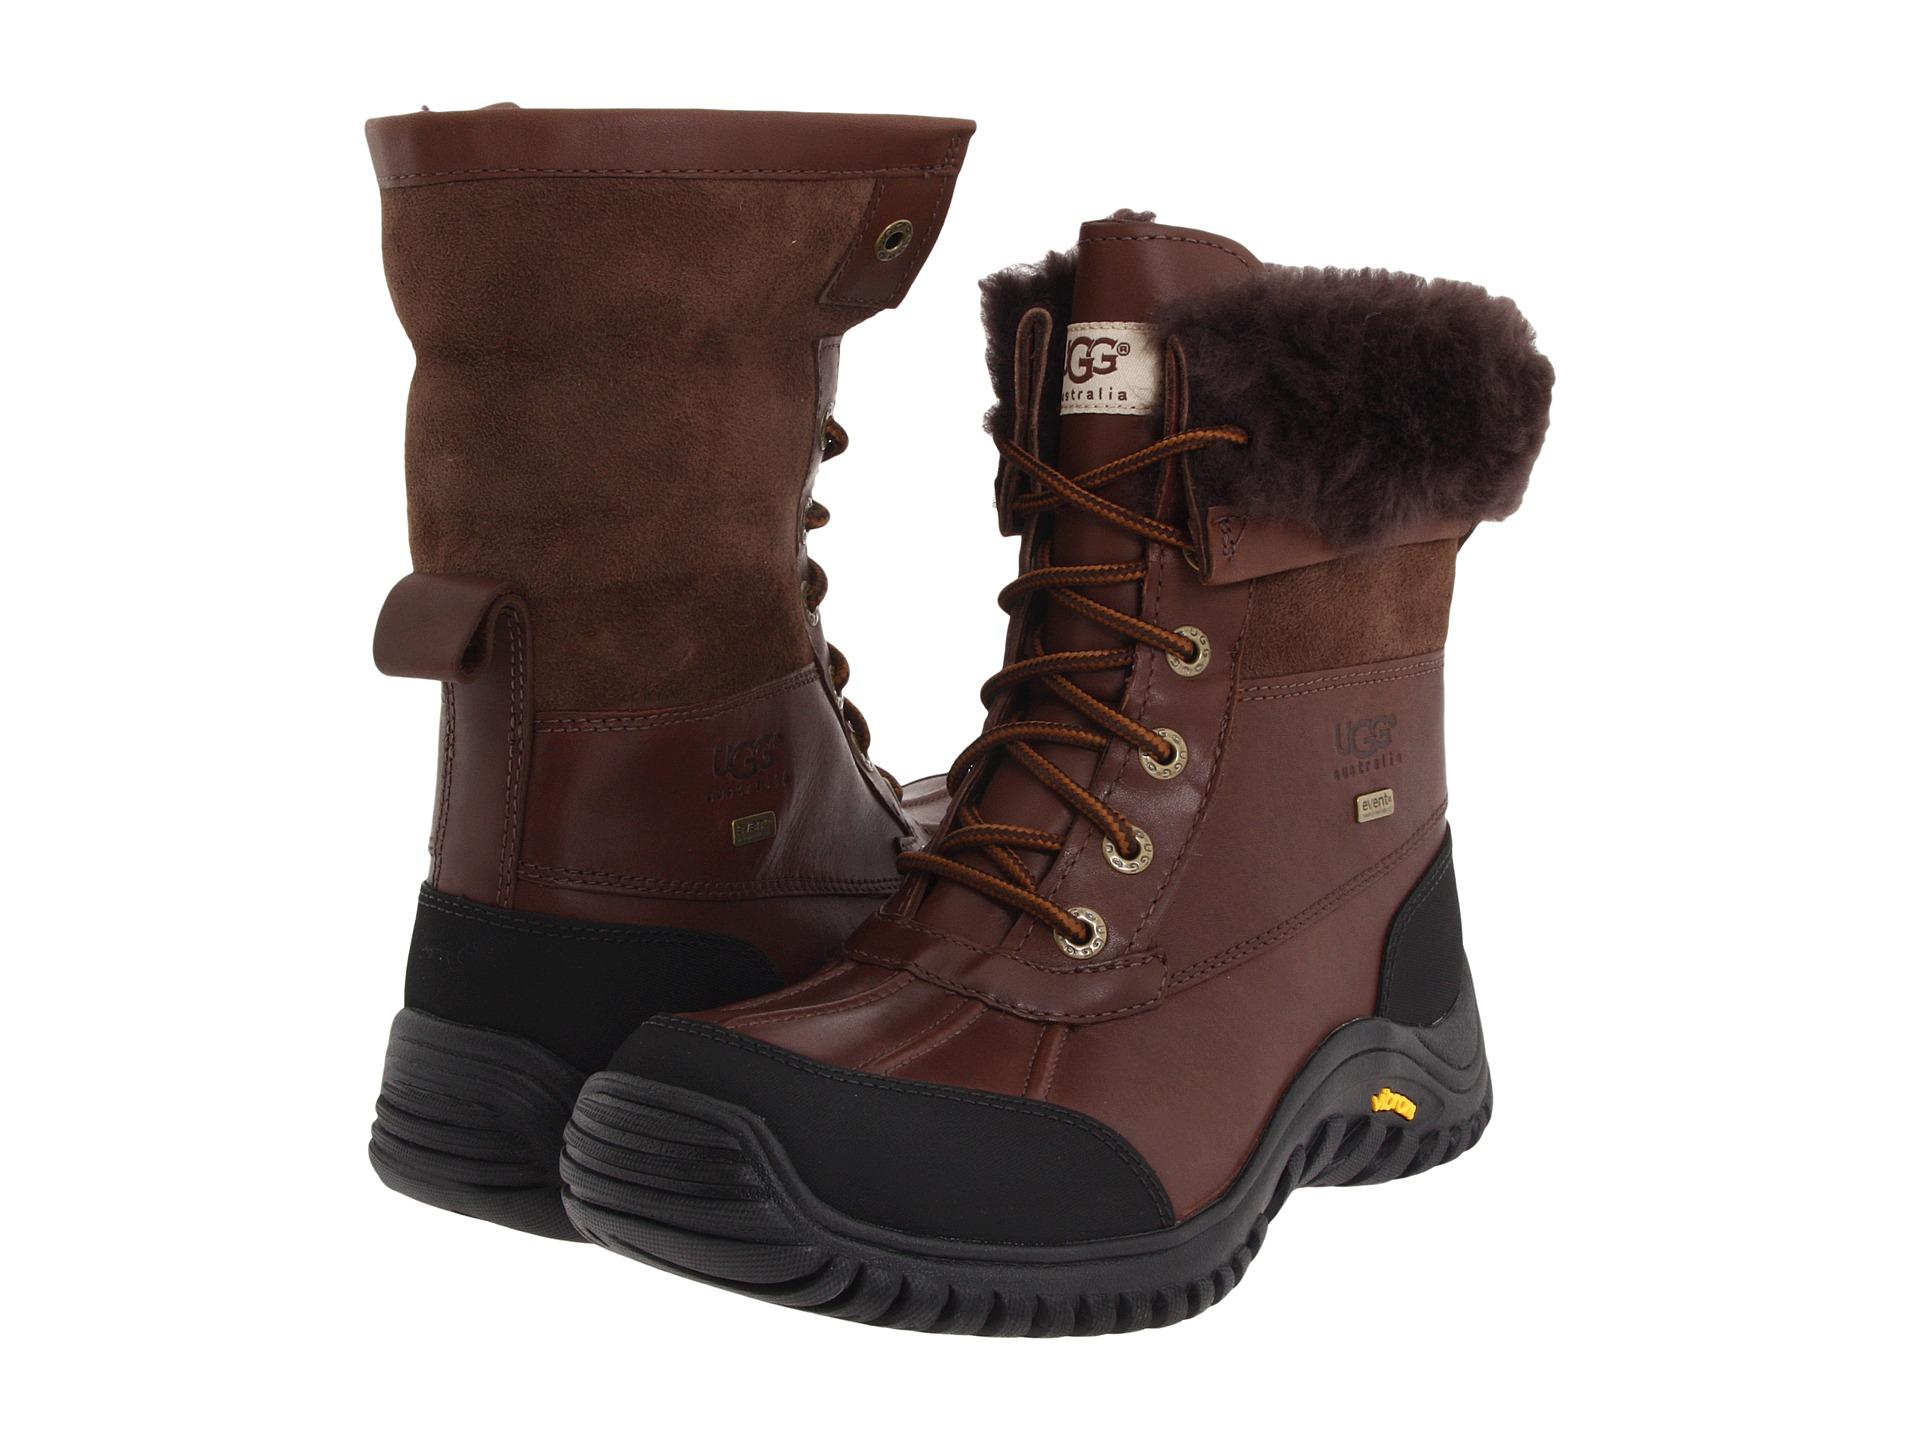 UGG Adirondack Boot II - Zappos.com Free Shipping BOTH Ways